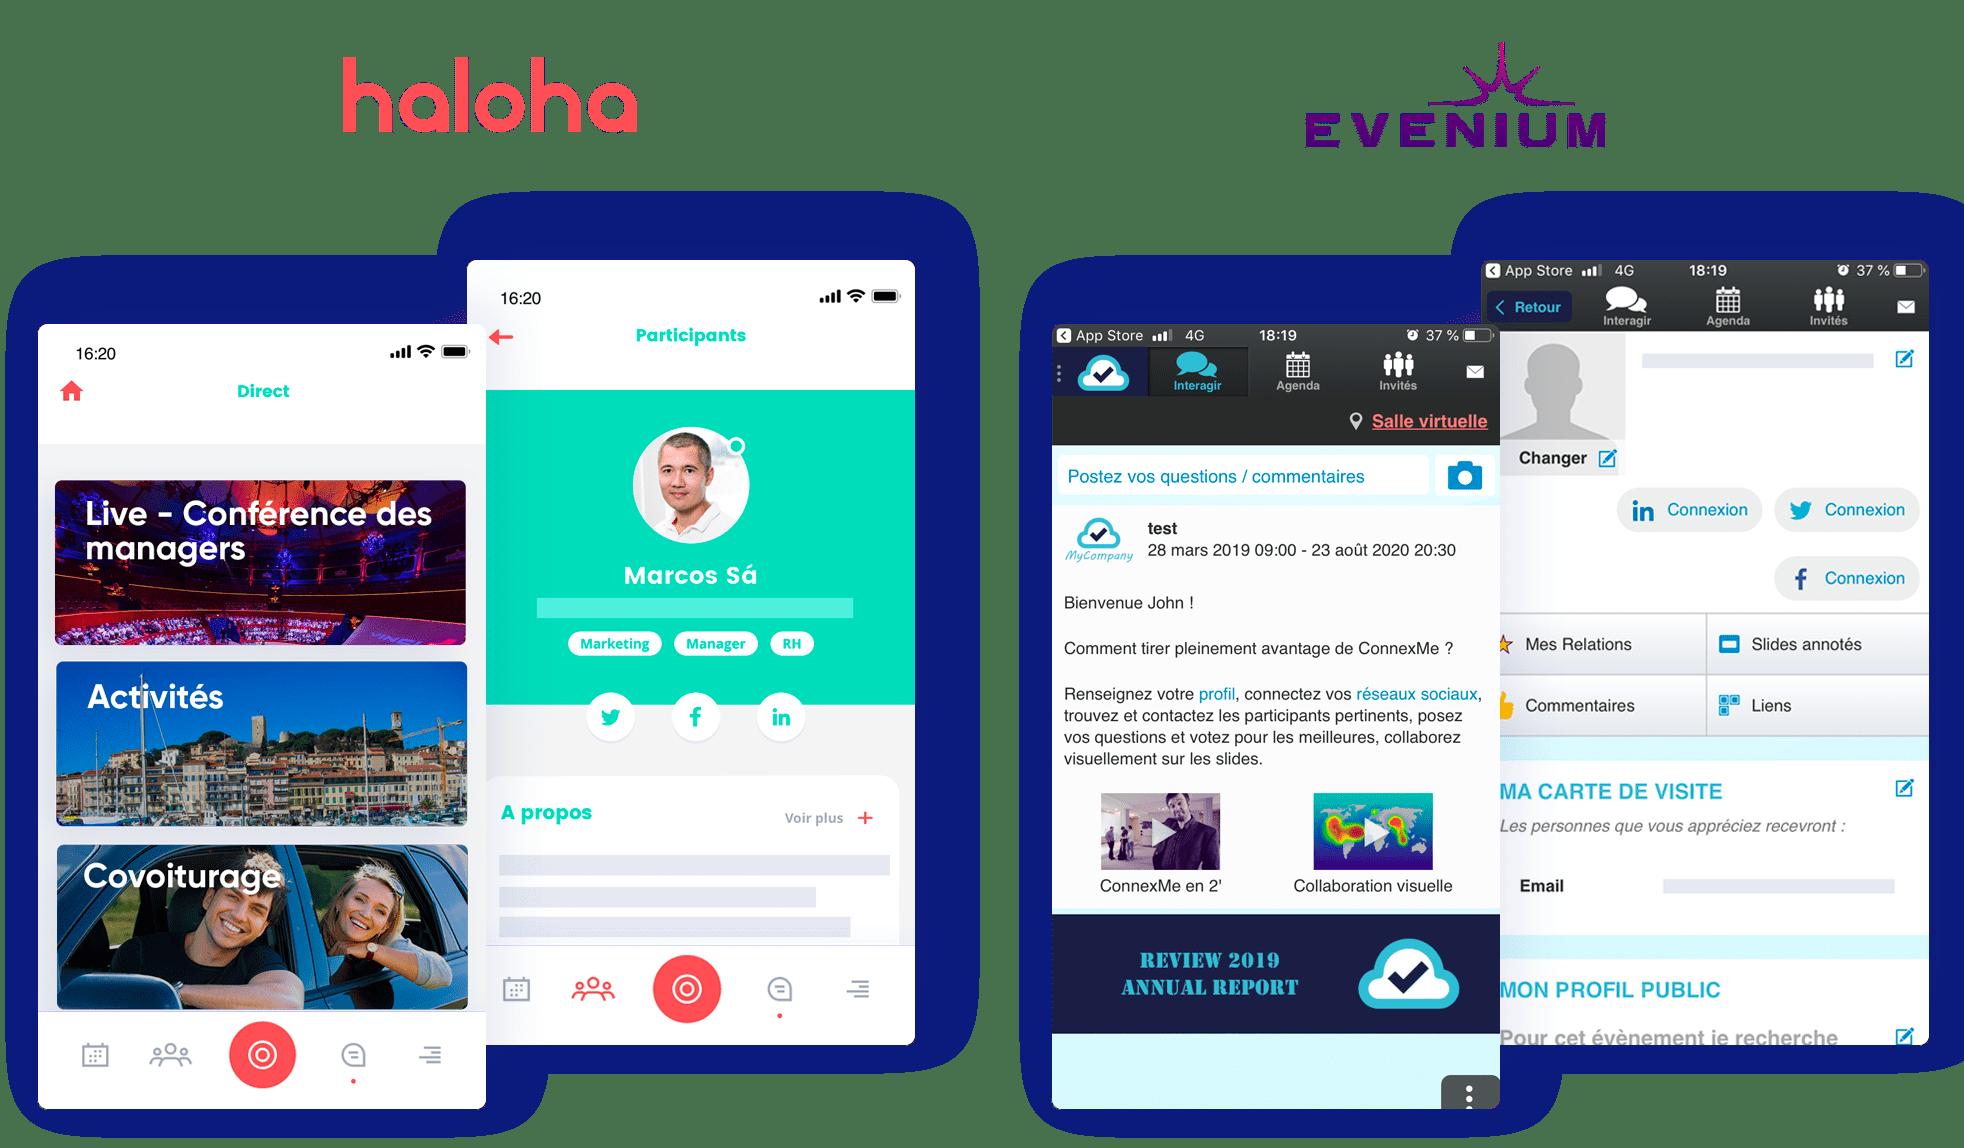 Expérience Haloha vs Evenium